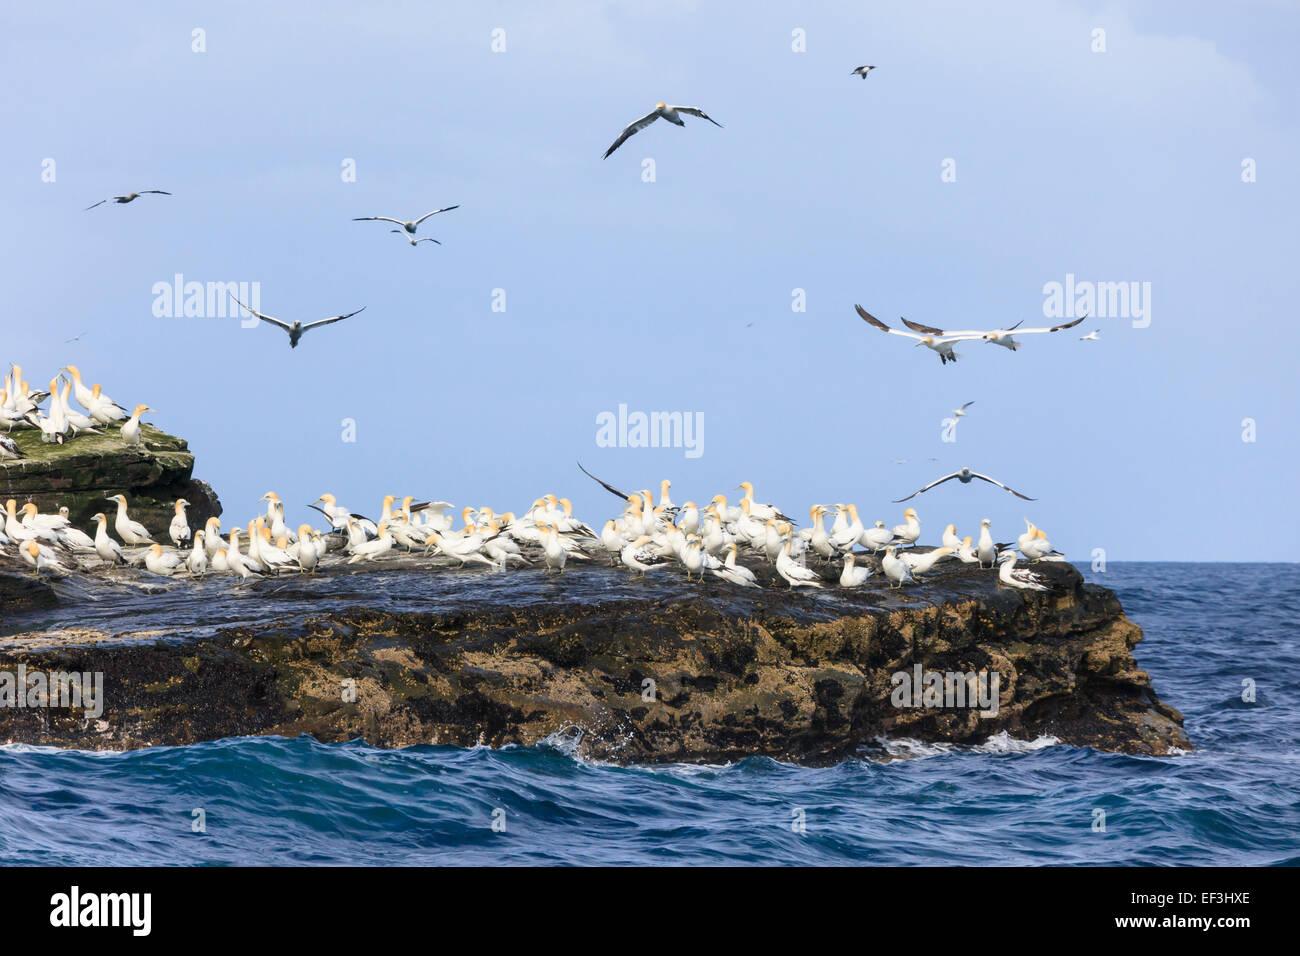 Colony of Gannets (Morus bassanus) on rock ledges during summer breeding season. Isle of Noss Nature Reserve Shetland - Stock Image